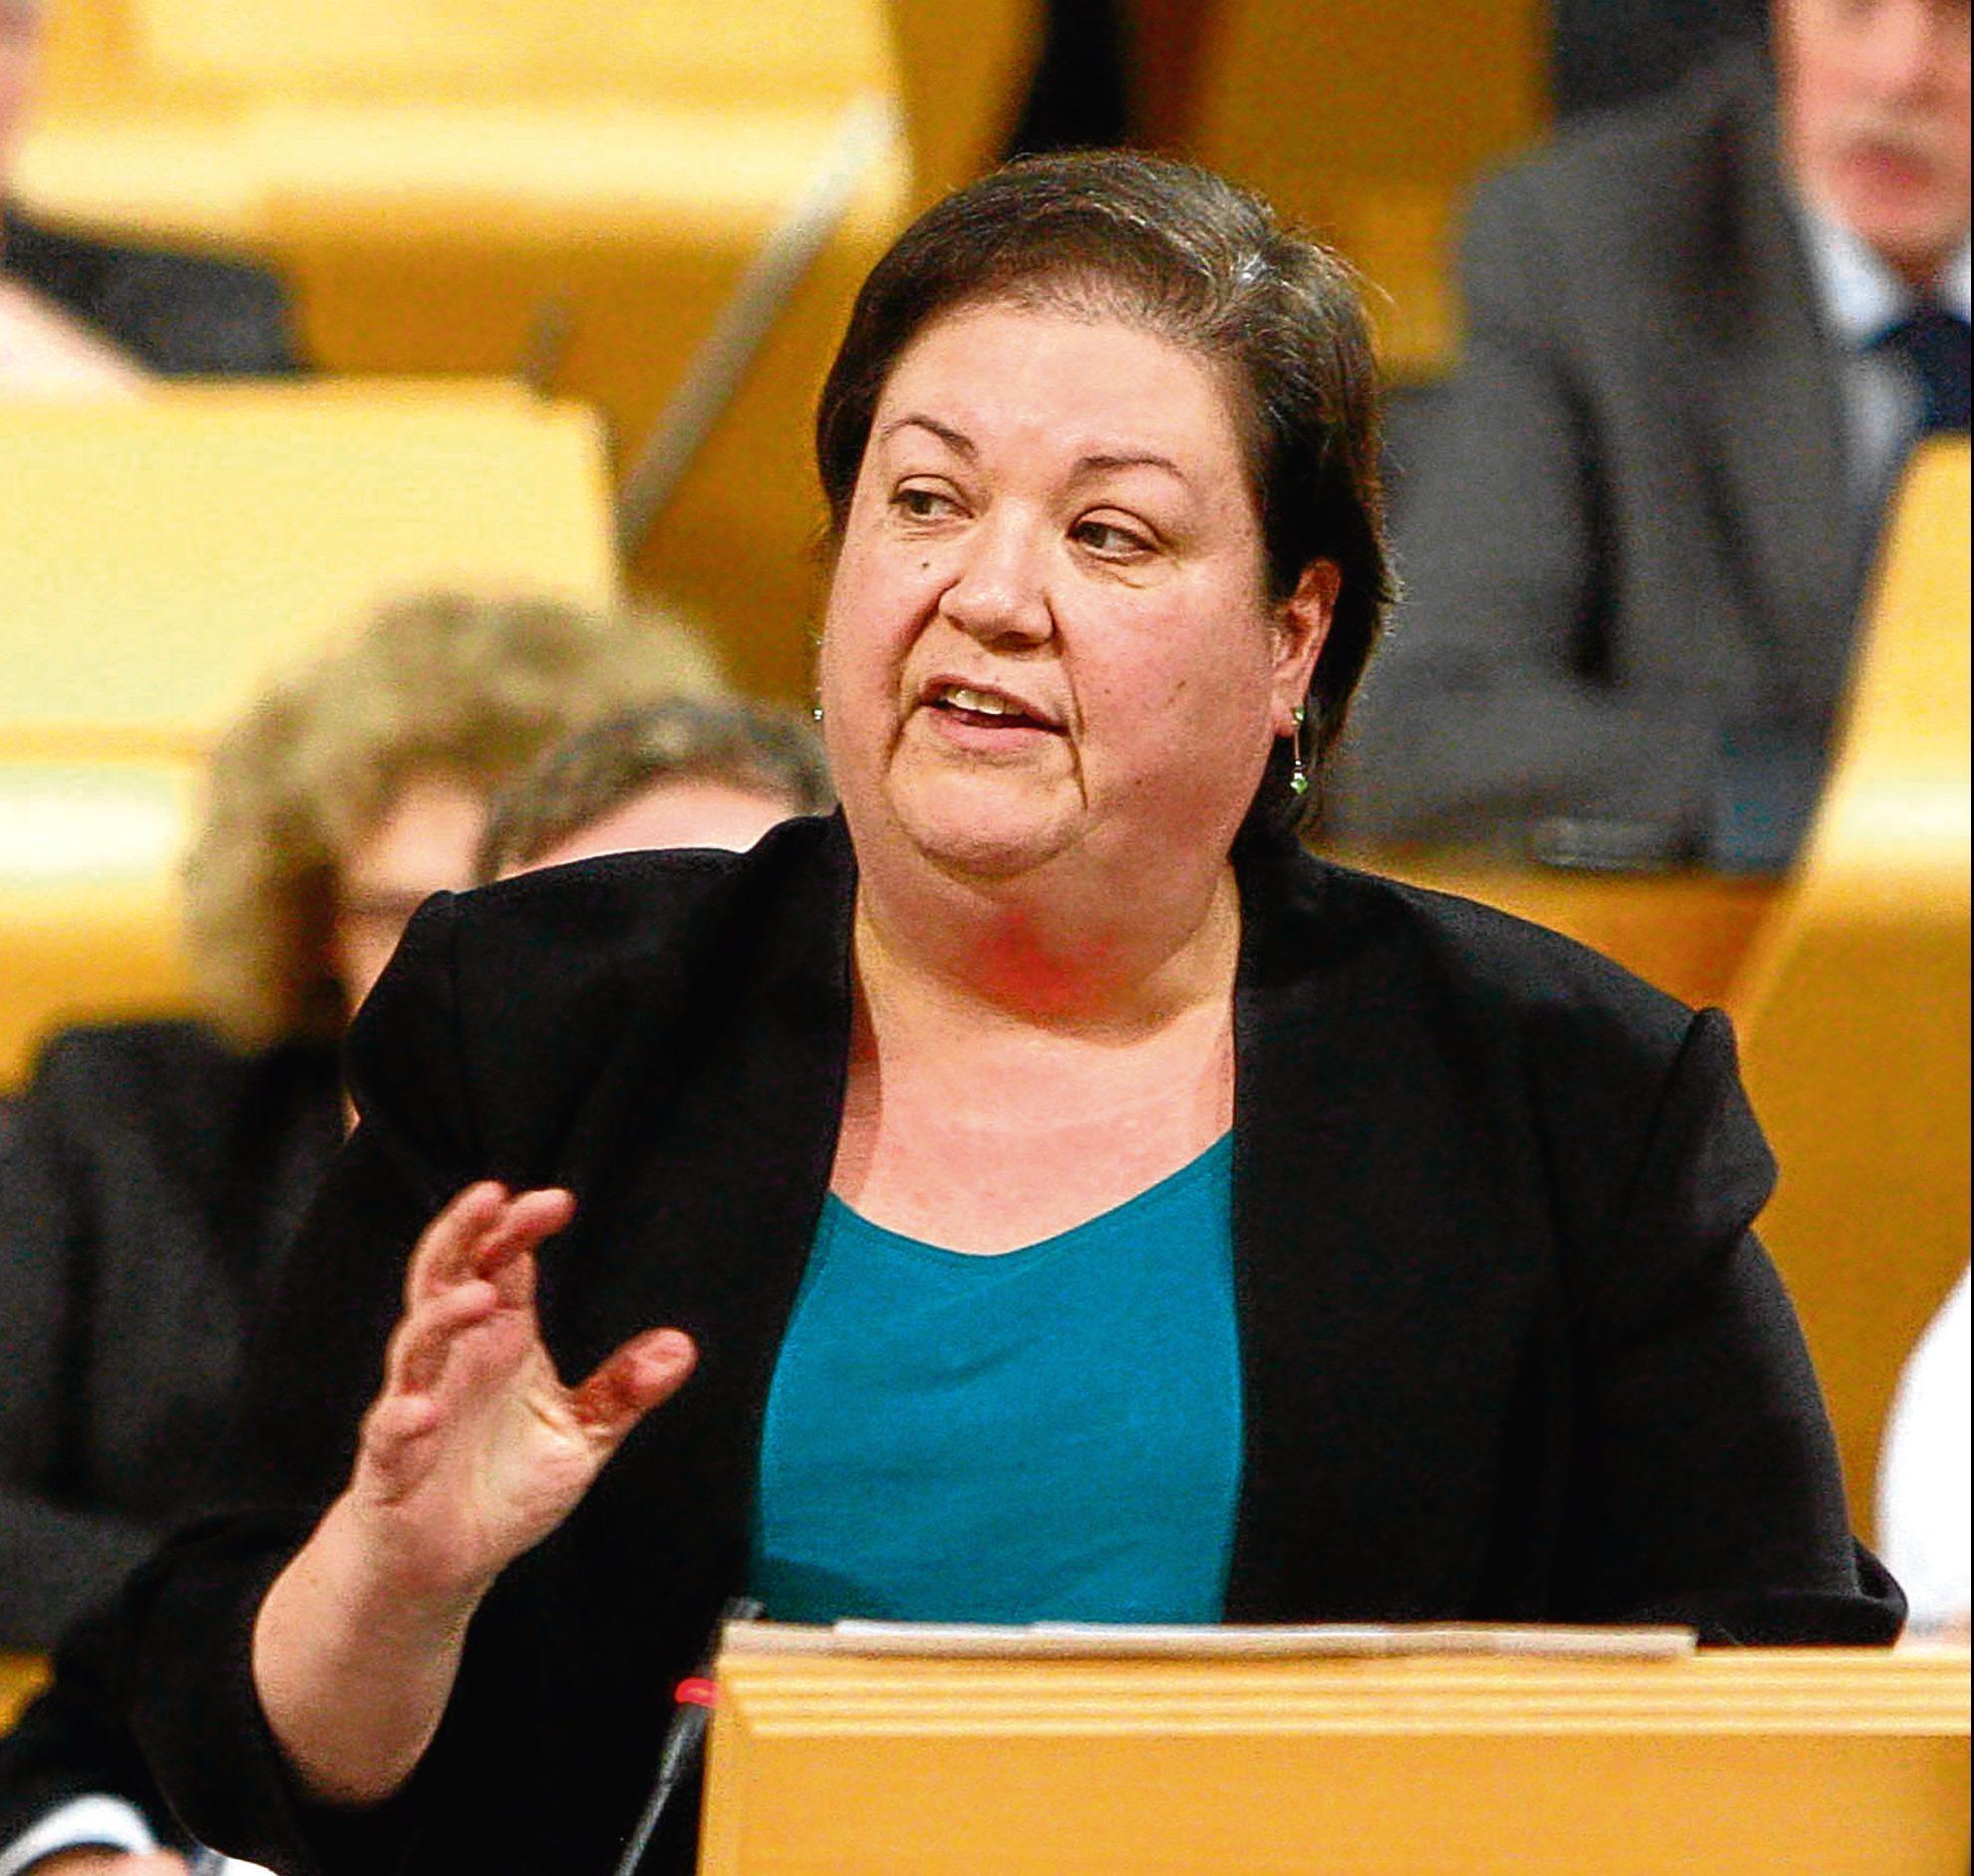 Jackie Baillie MSP (Andrew Cowan/Scottish Parliament)